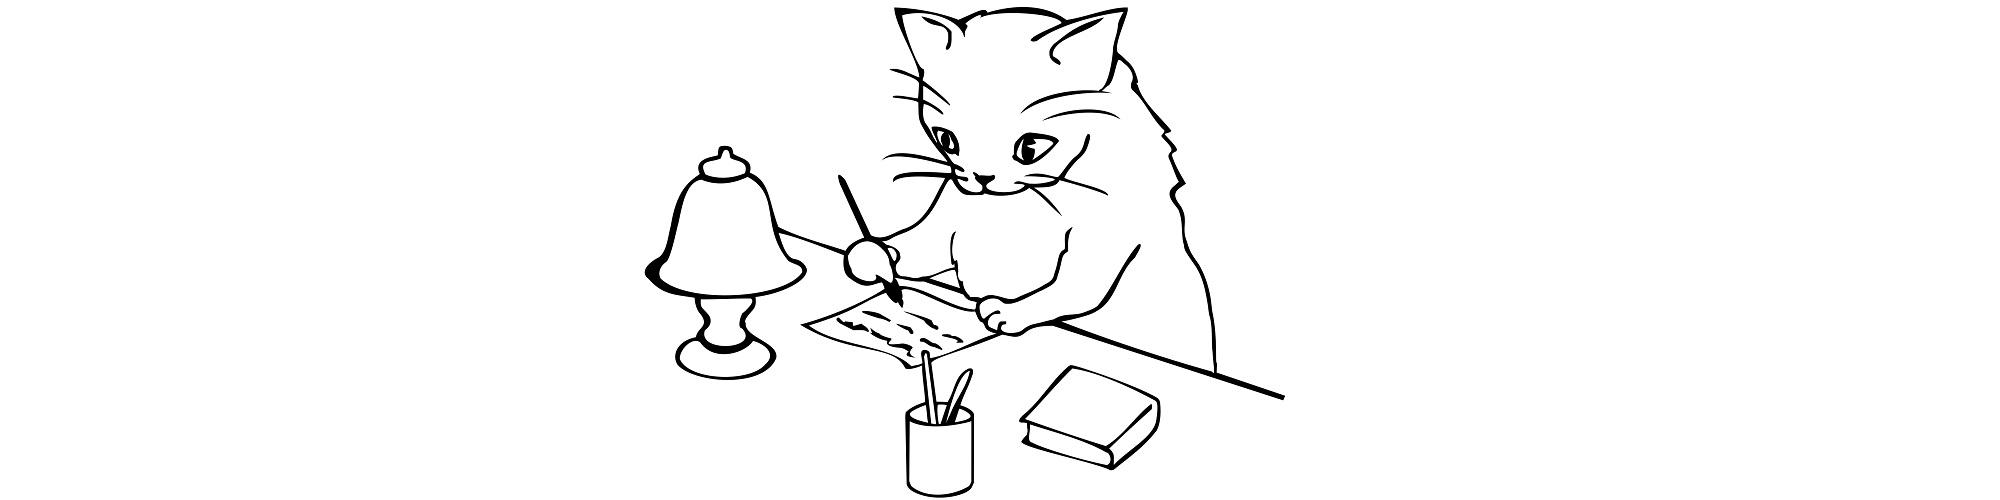 Cat writing illustration